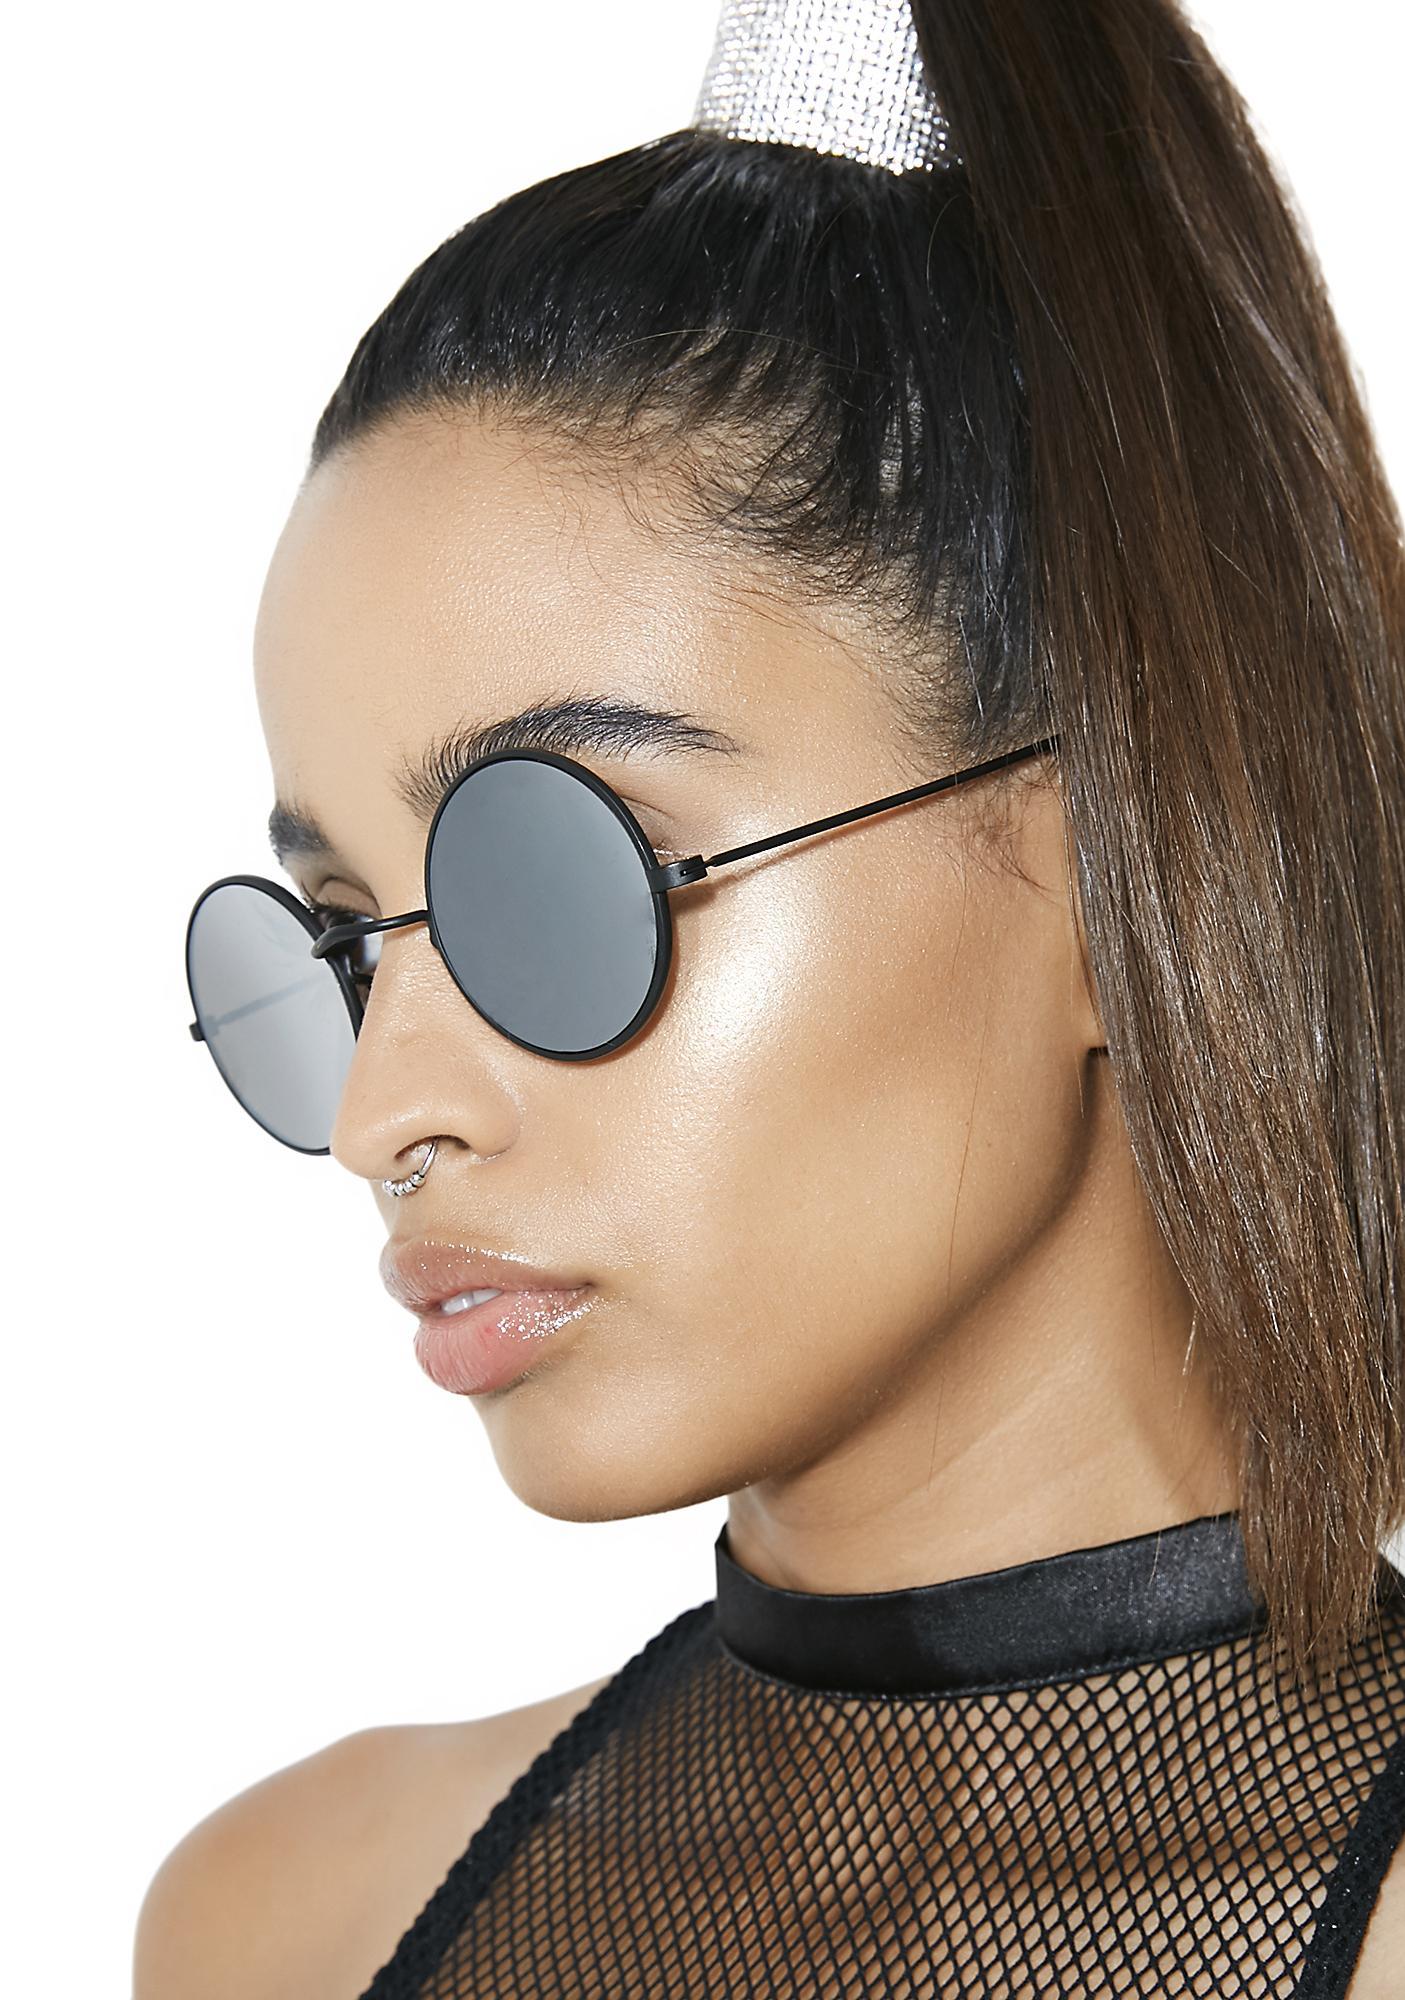 Transylvania Sunglasses